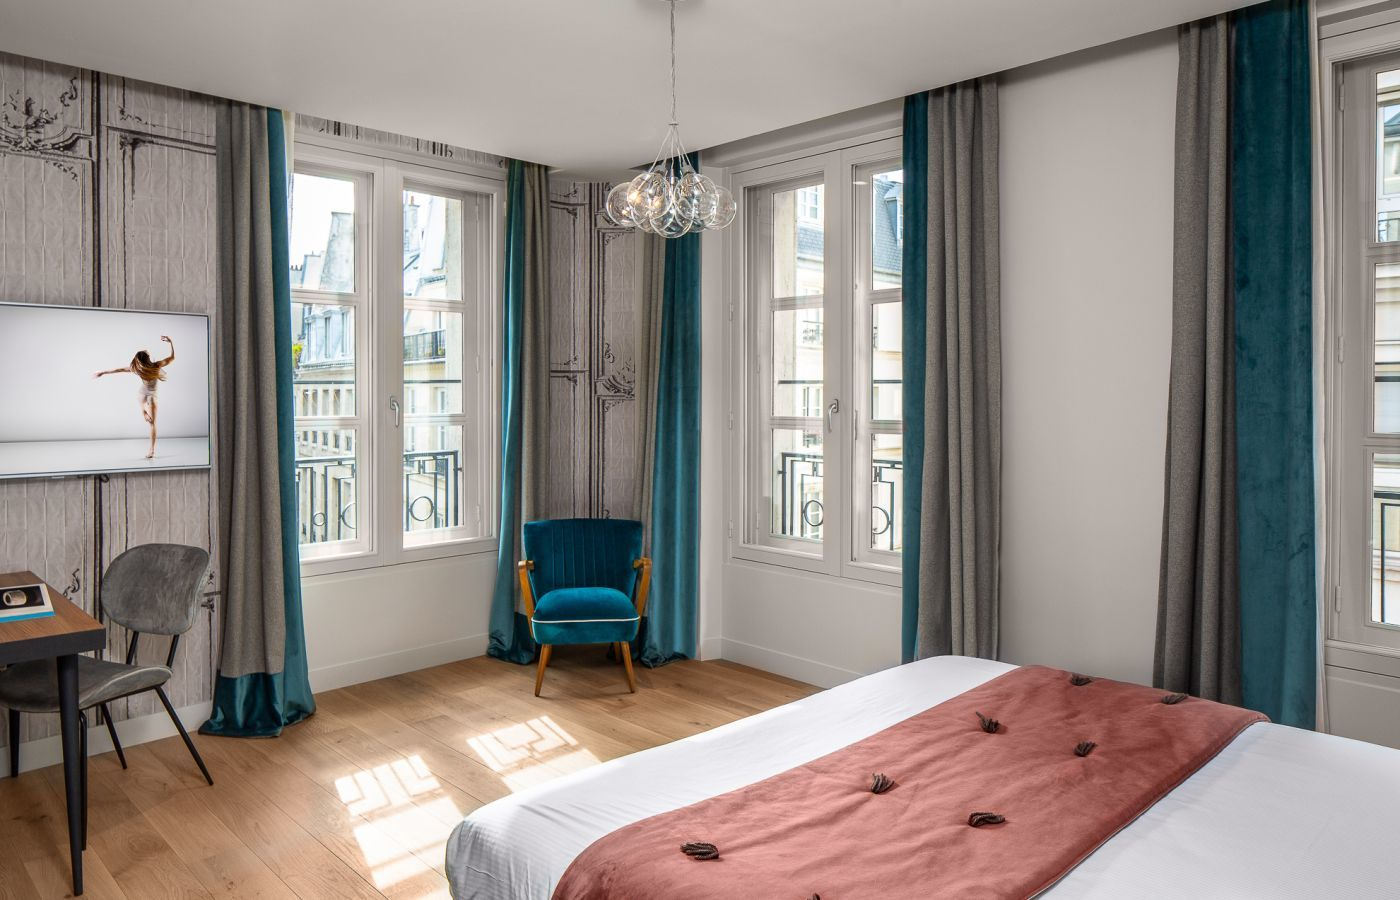 Lyrics Hotel, Paris